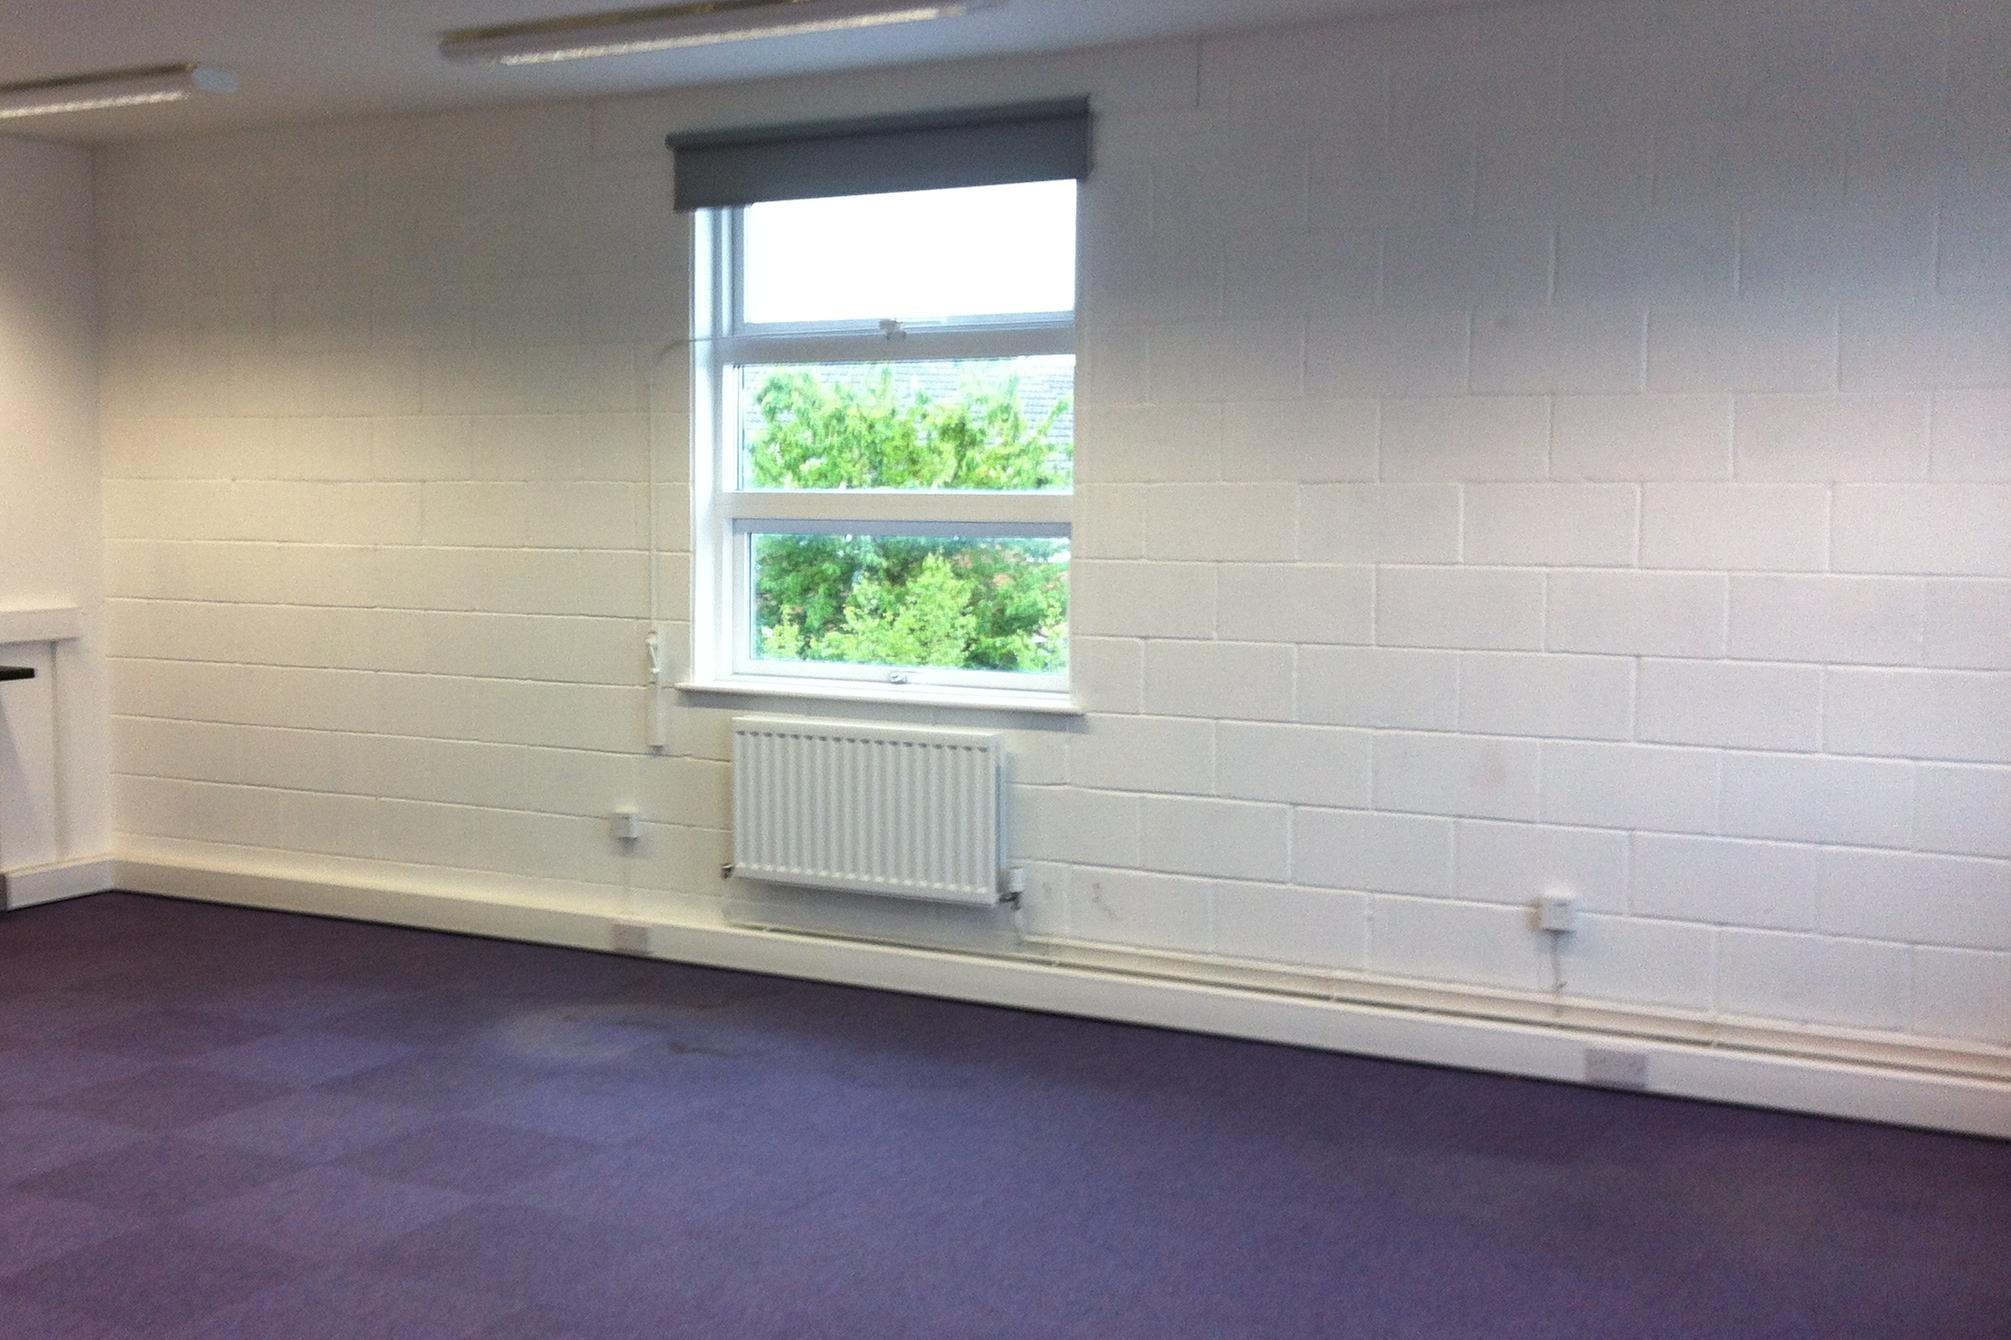 Castleham Business Centre East, Unit 25, St Leonards On Sea, Office / Industrial To Let - 30 internal.JPG